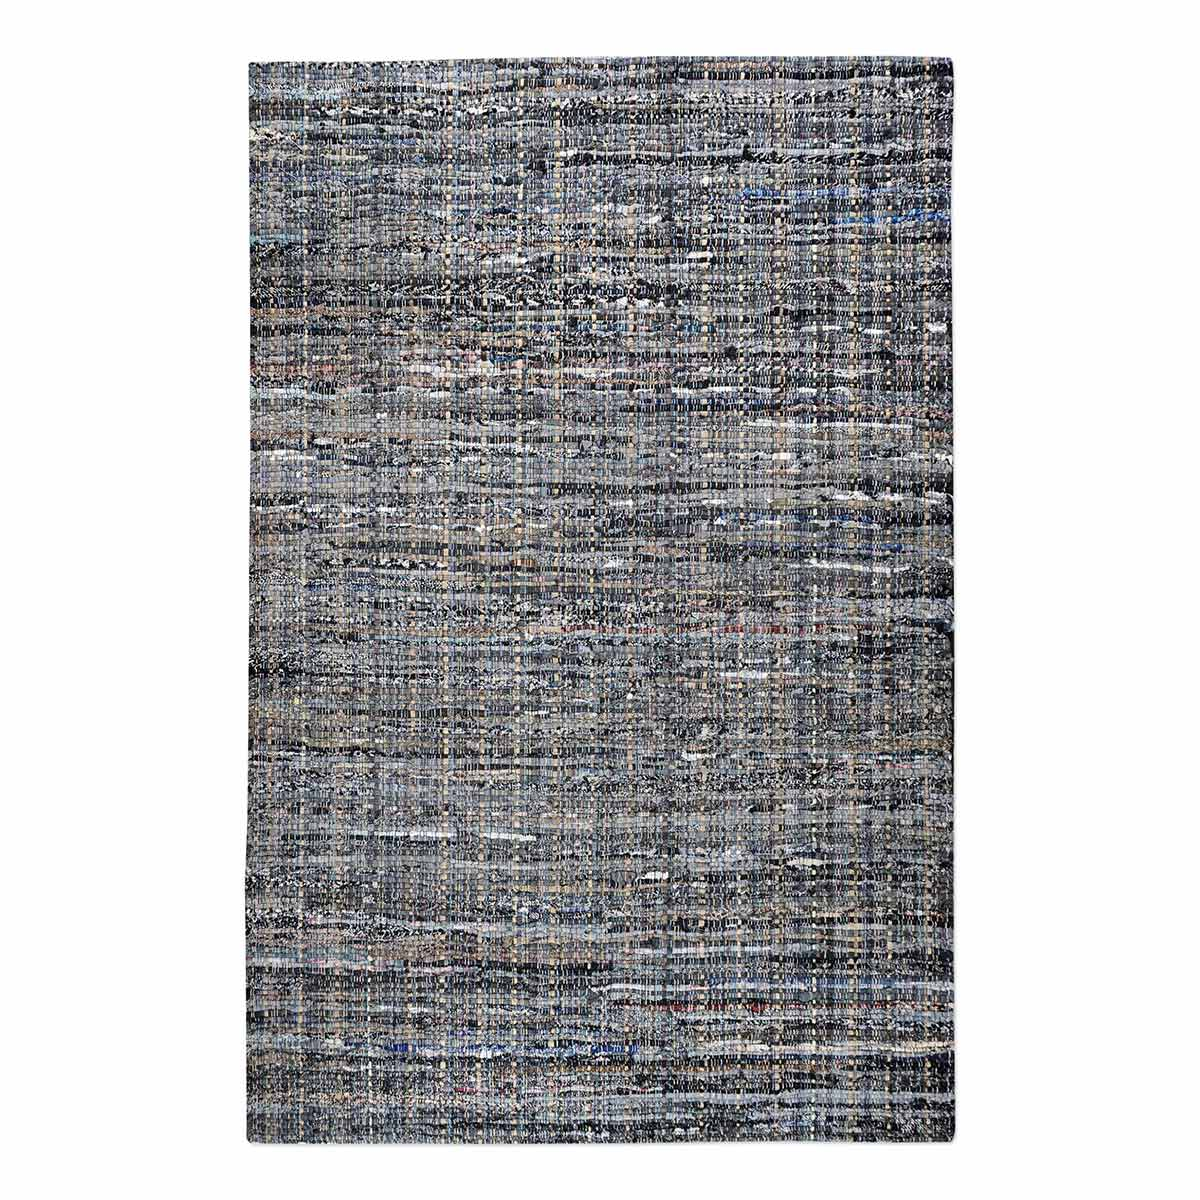 Uttermost Ramey 8 x 10 Rug - Blue-Gray